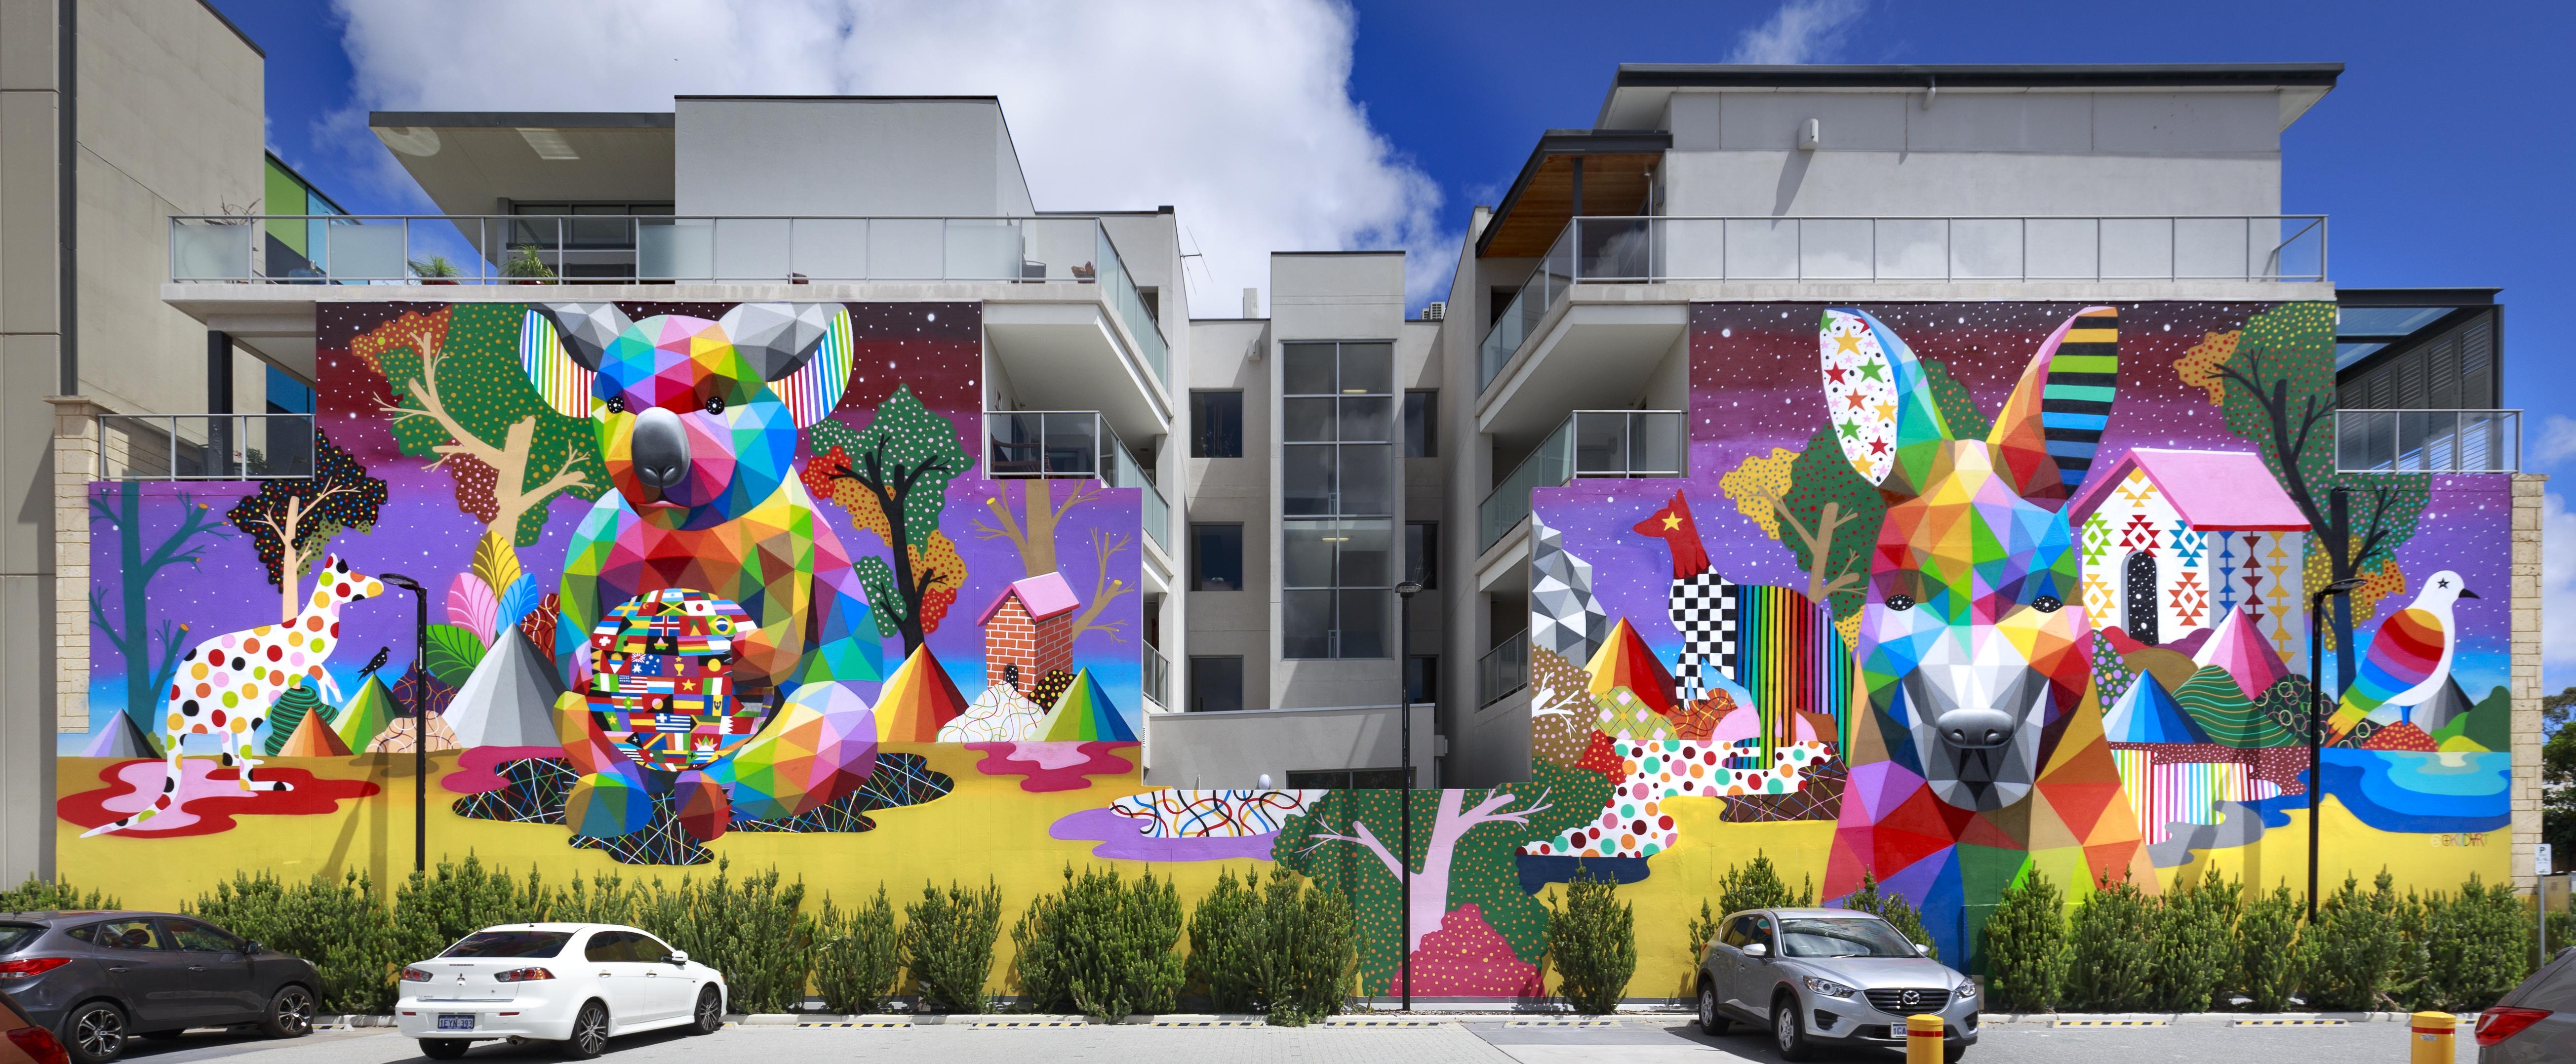 Mural by Okudart